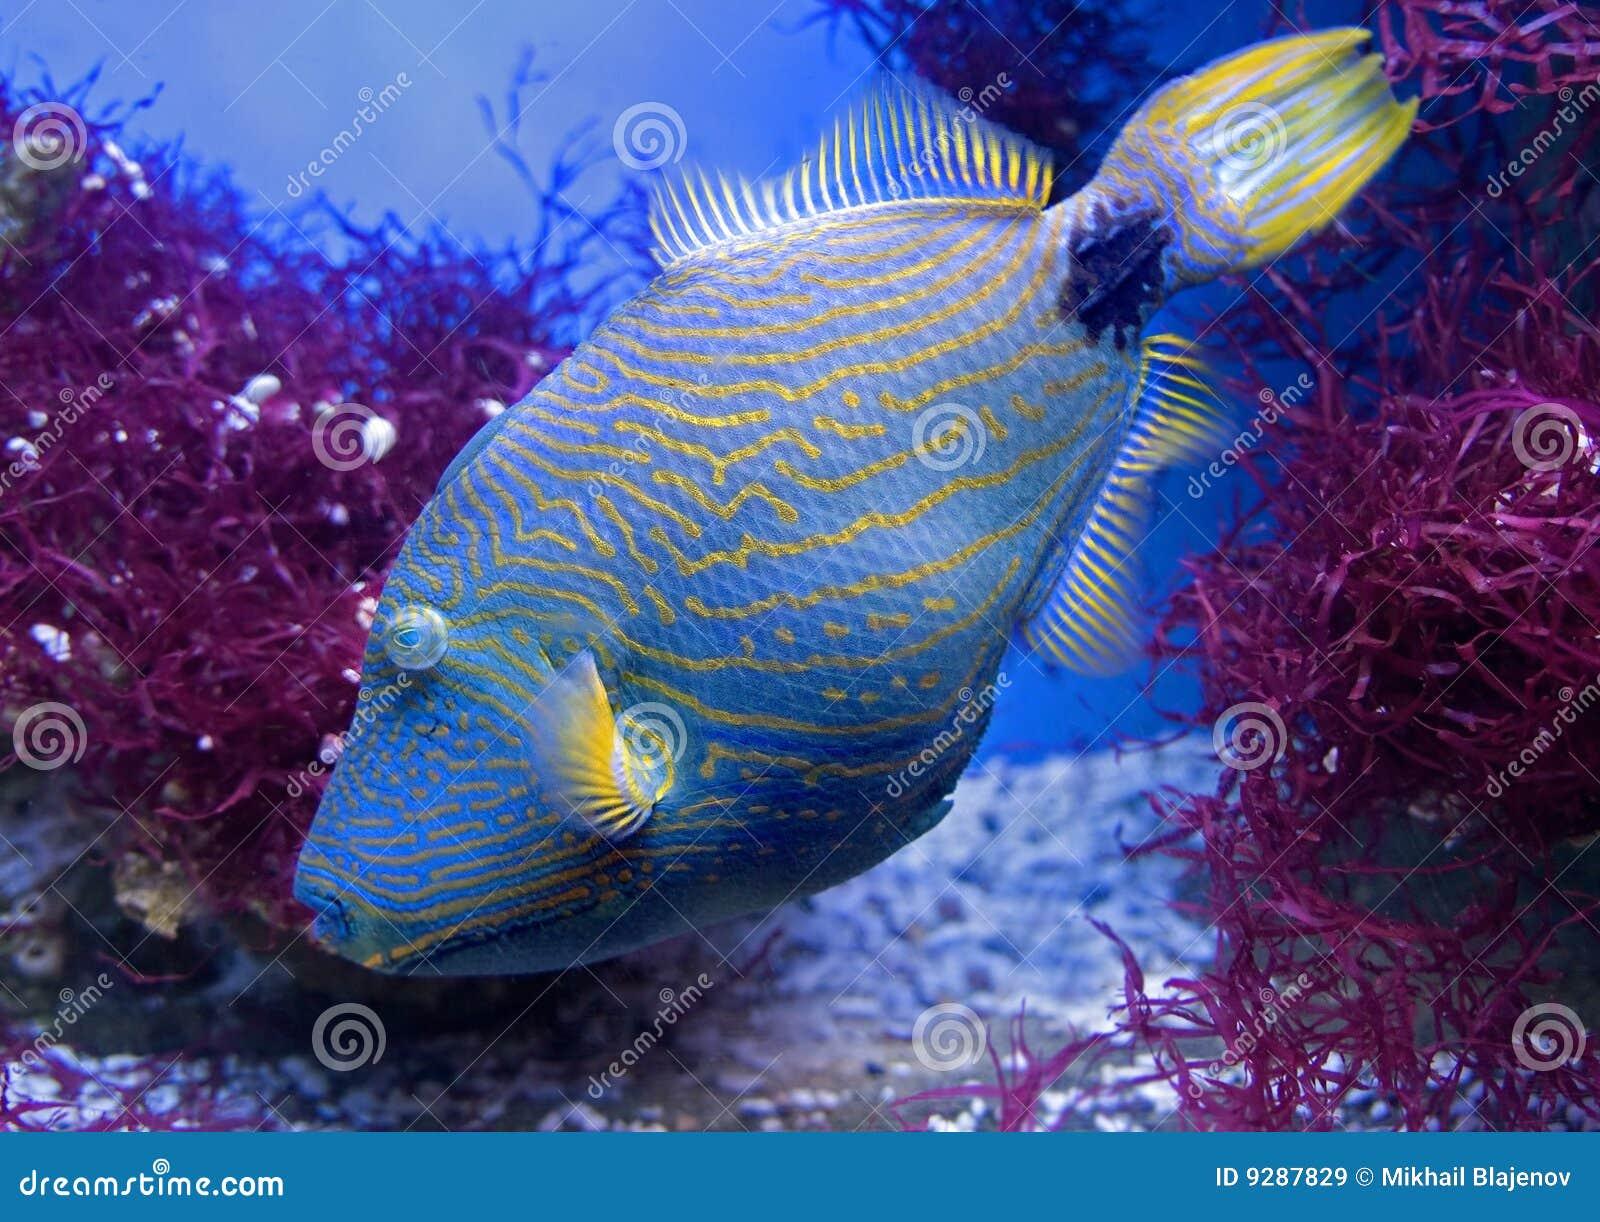 undulate triggerfish 1 stock image image of multicolored 9287829